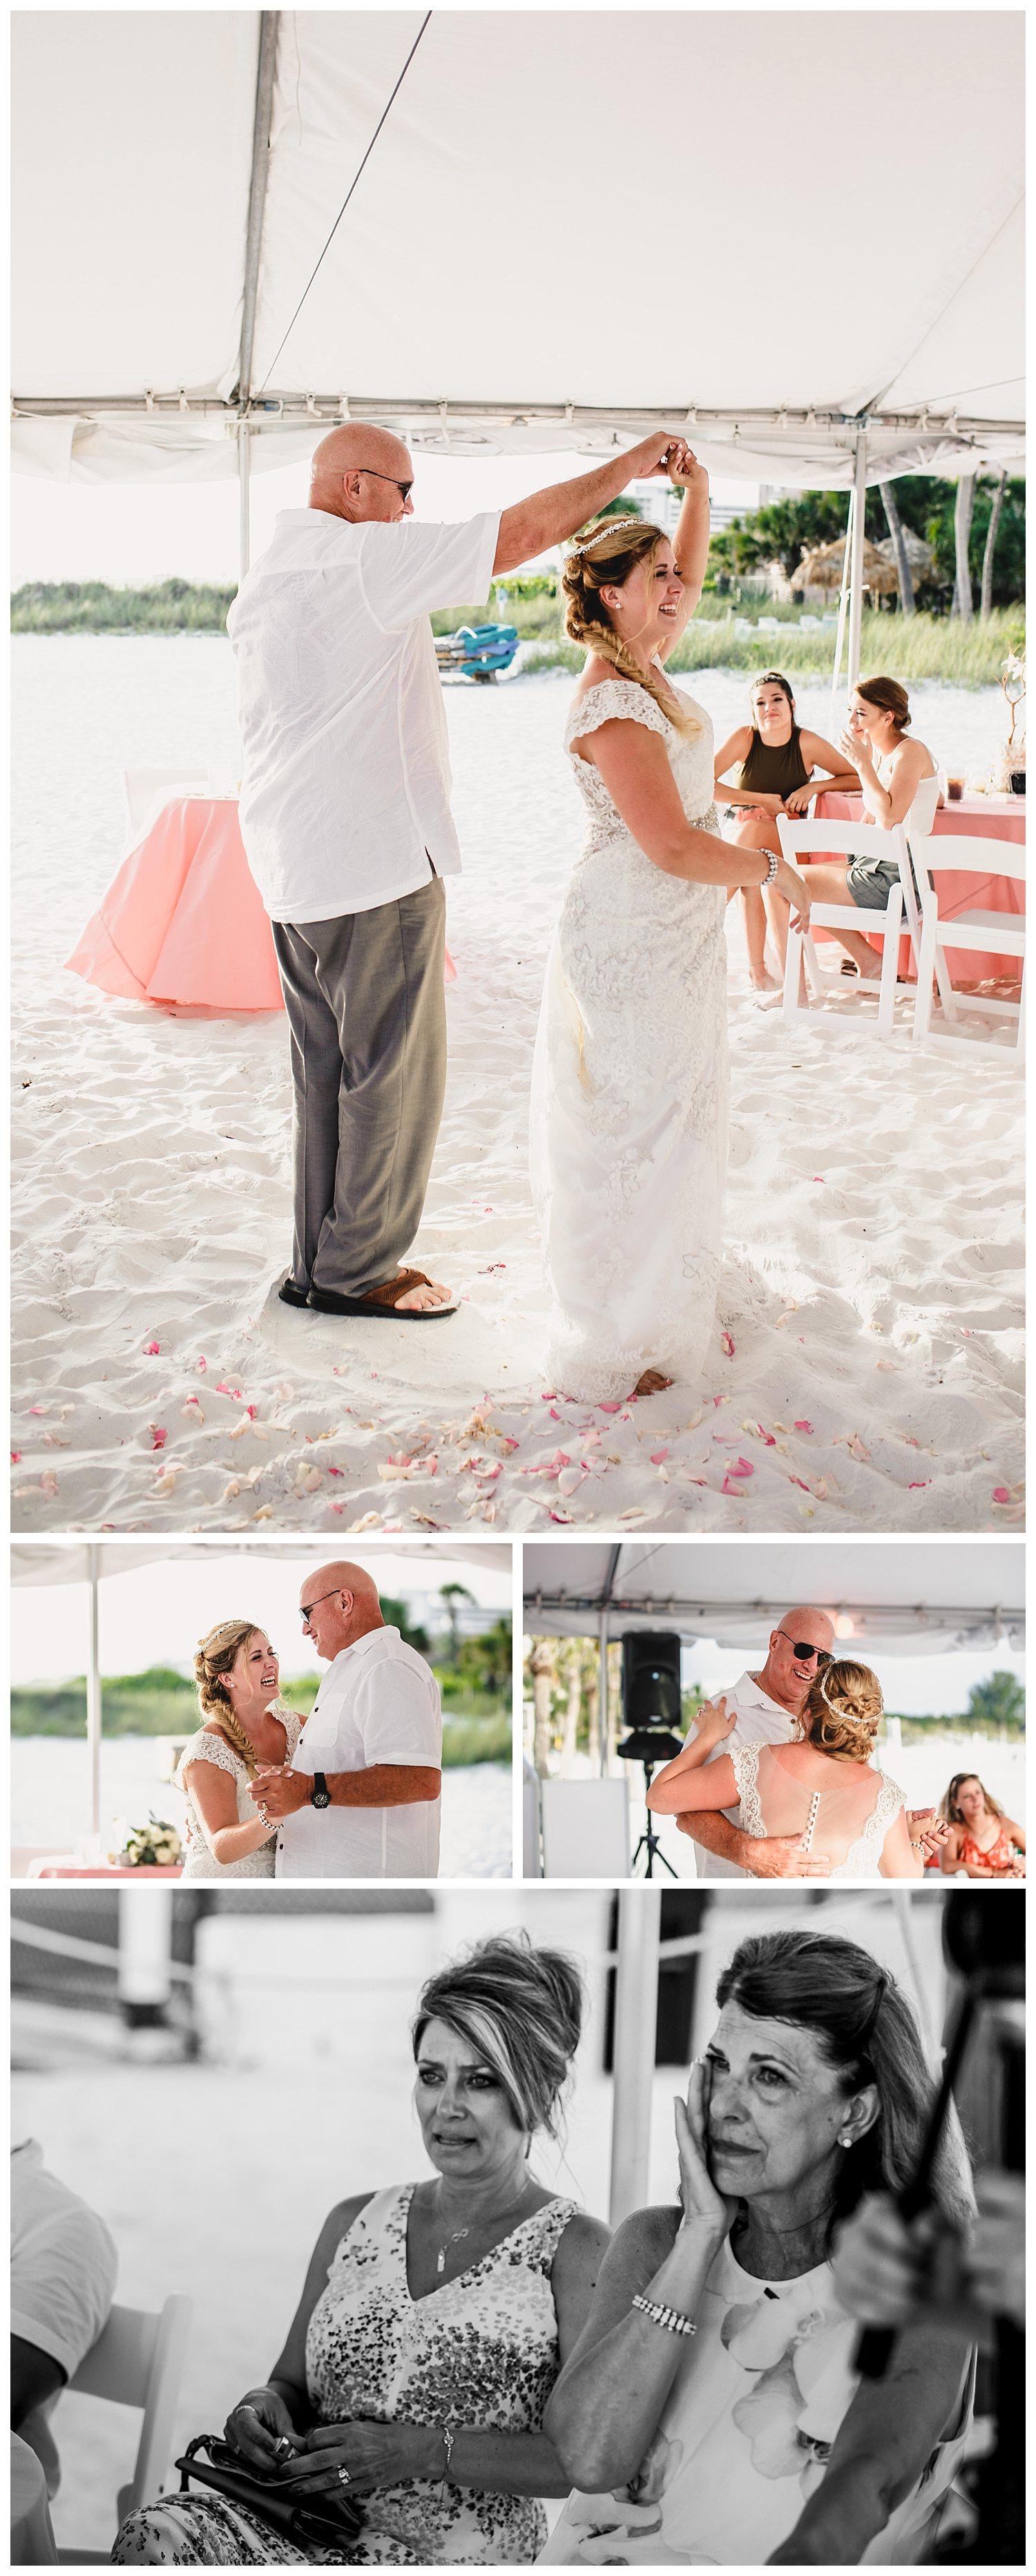 Kelsey_Diane_Photography_Destination_Wedding_Sarasota_Florida_Beach_Wedding_Alex_Austin_0668.jpg